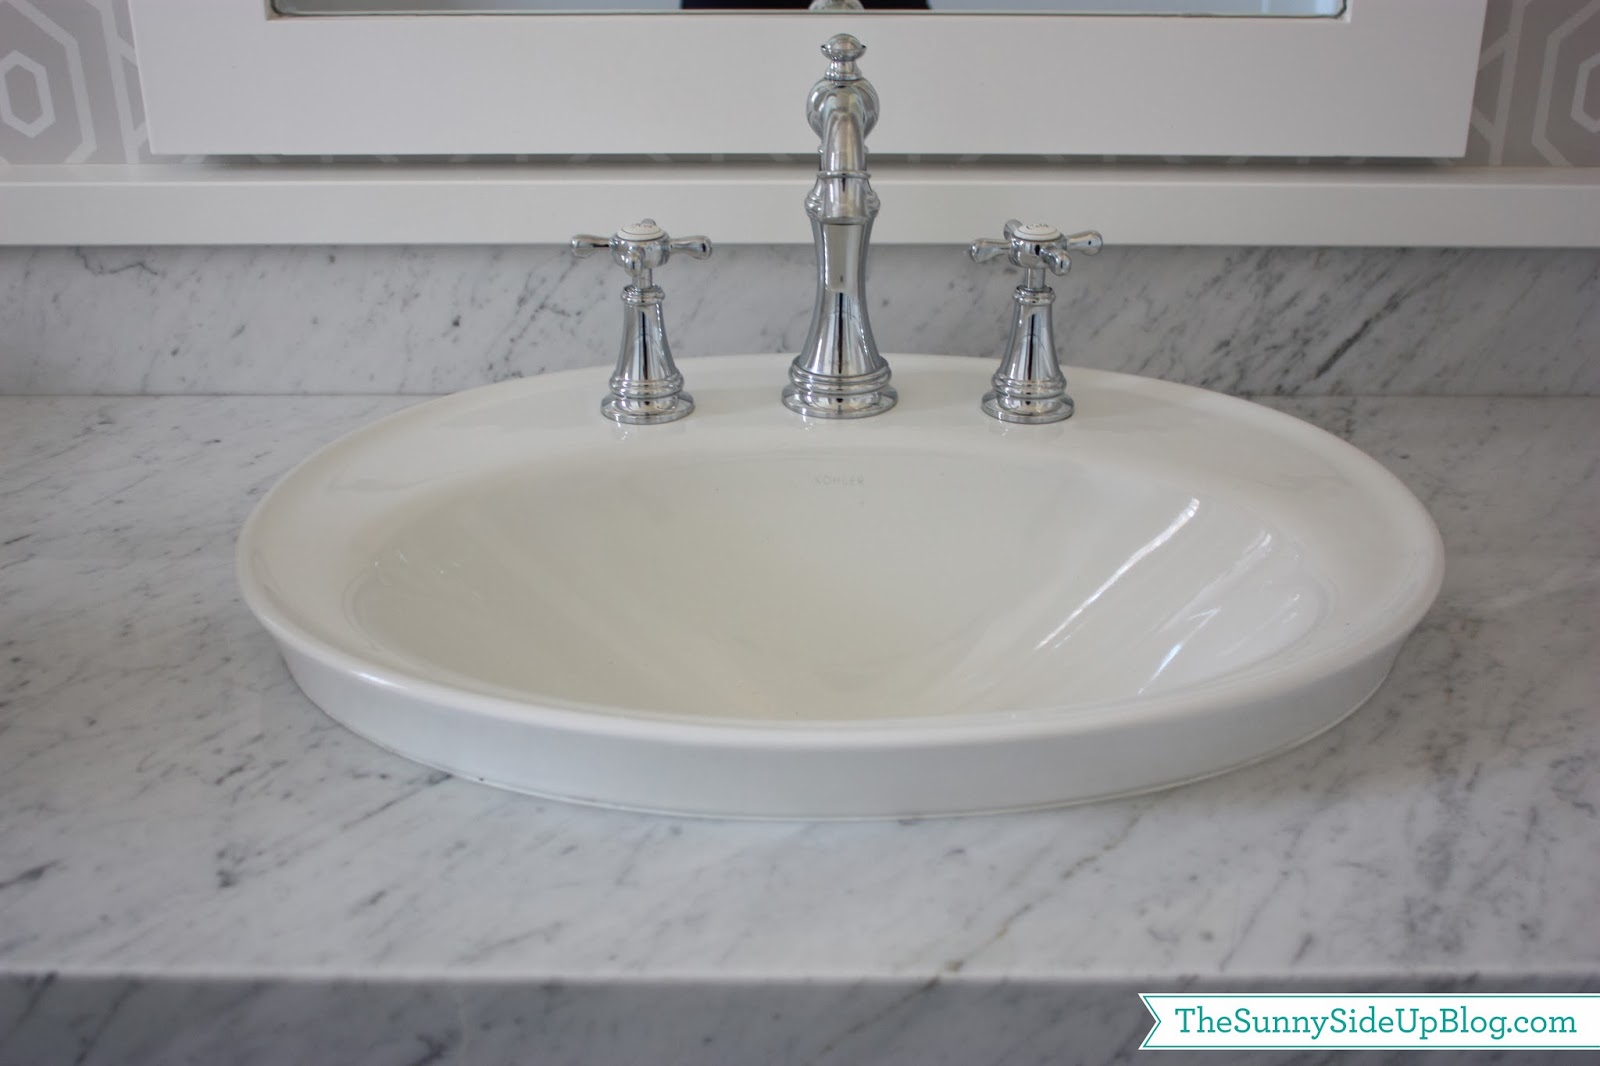 Powder Bathroom - The Sunny Side Up Blog